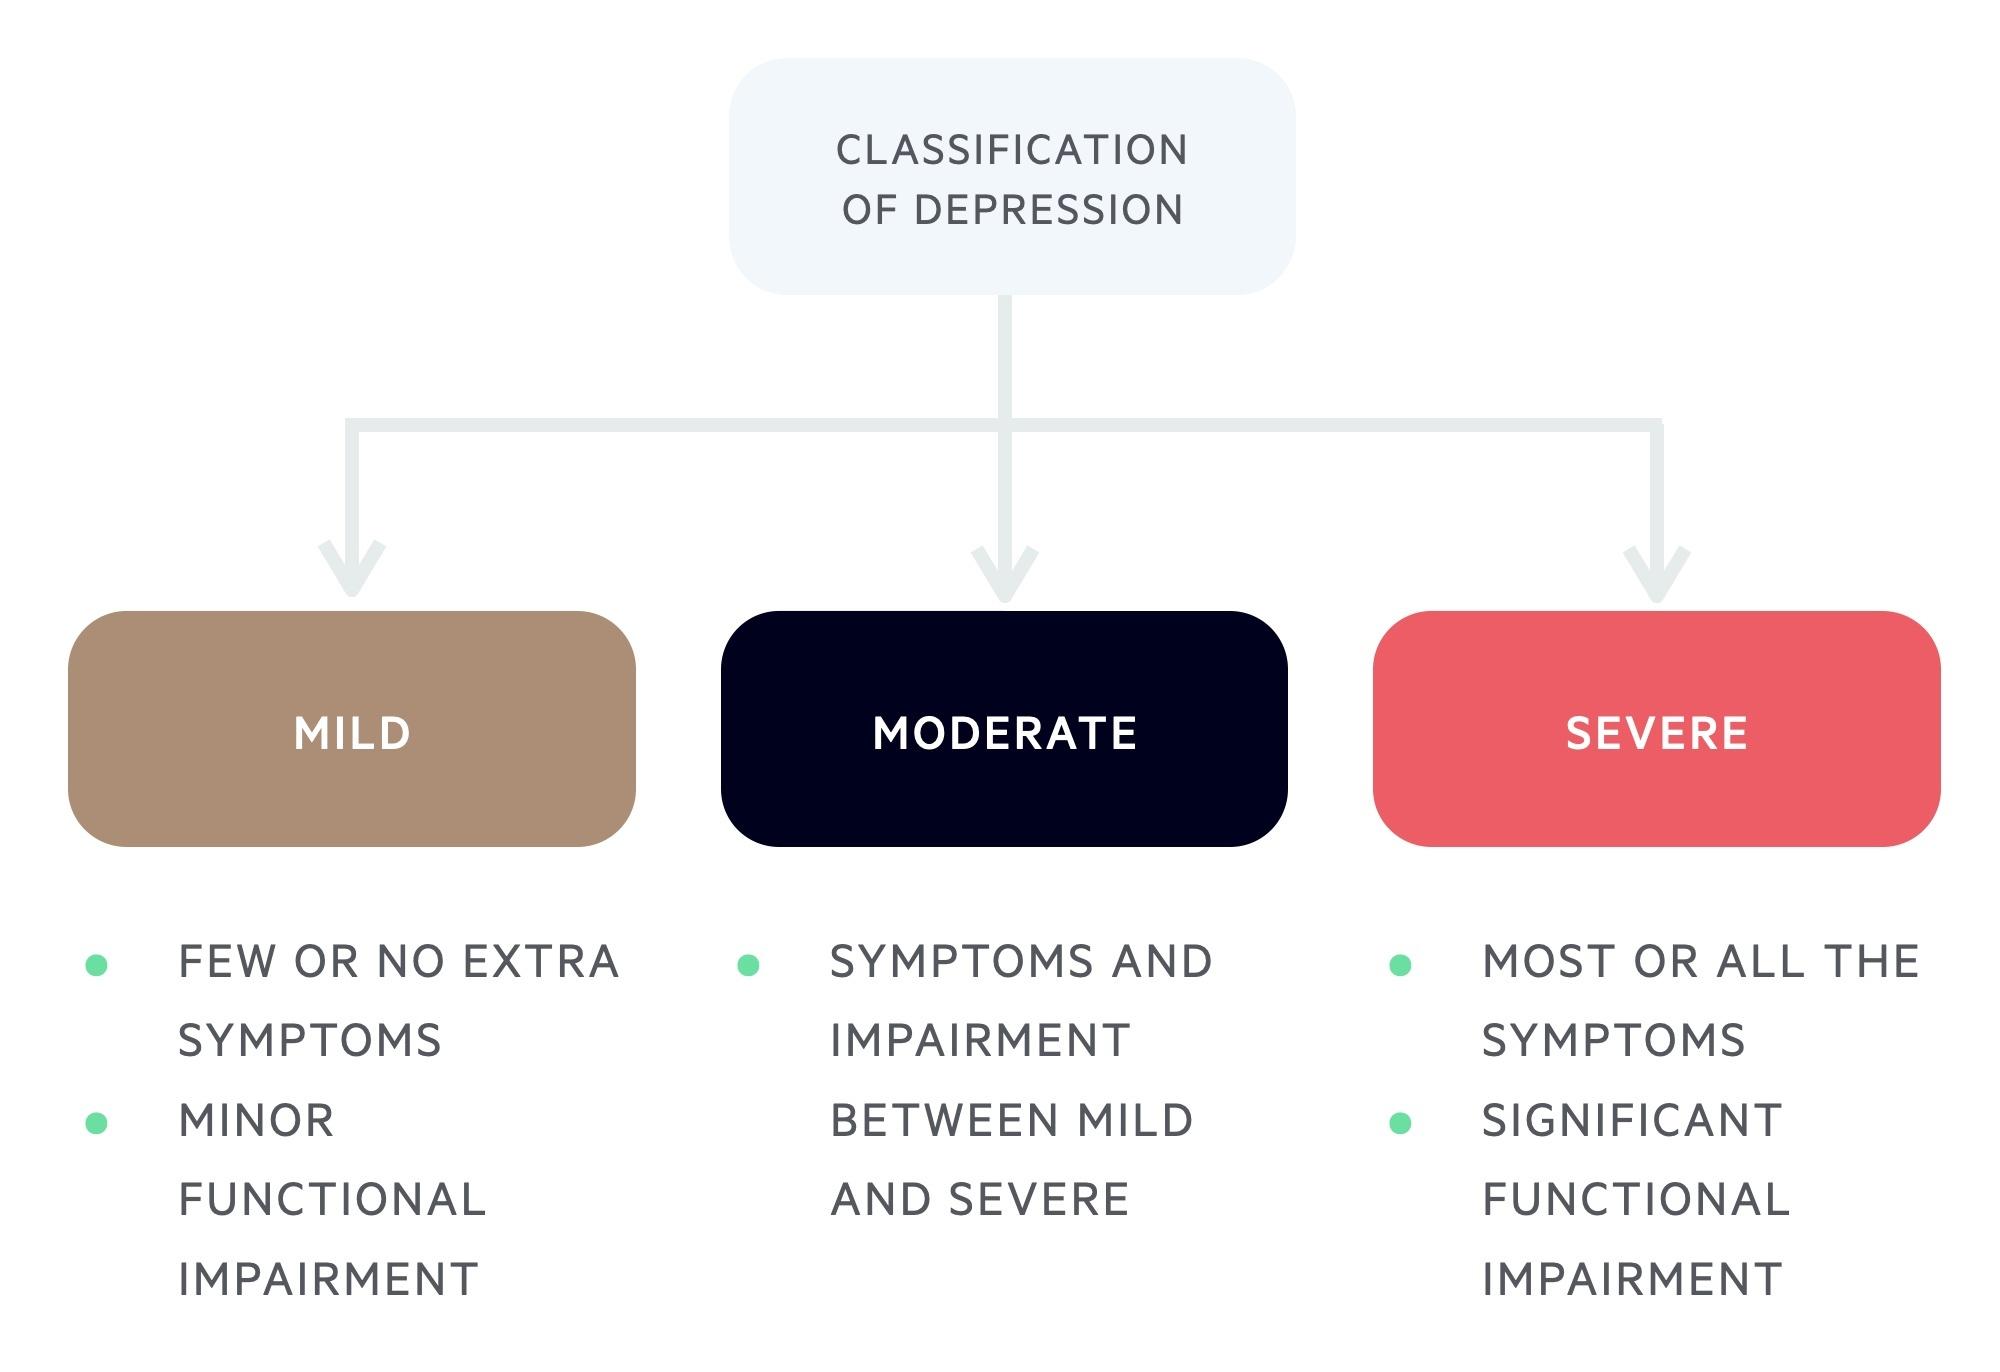 Classification of depression